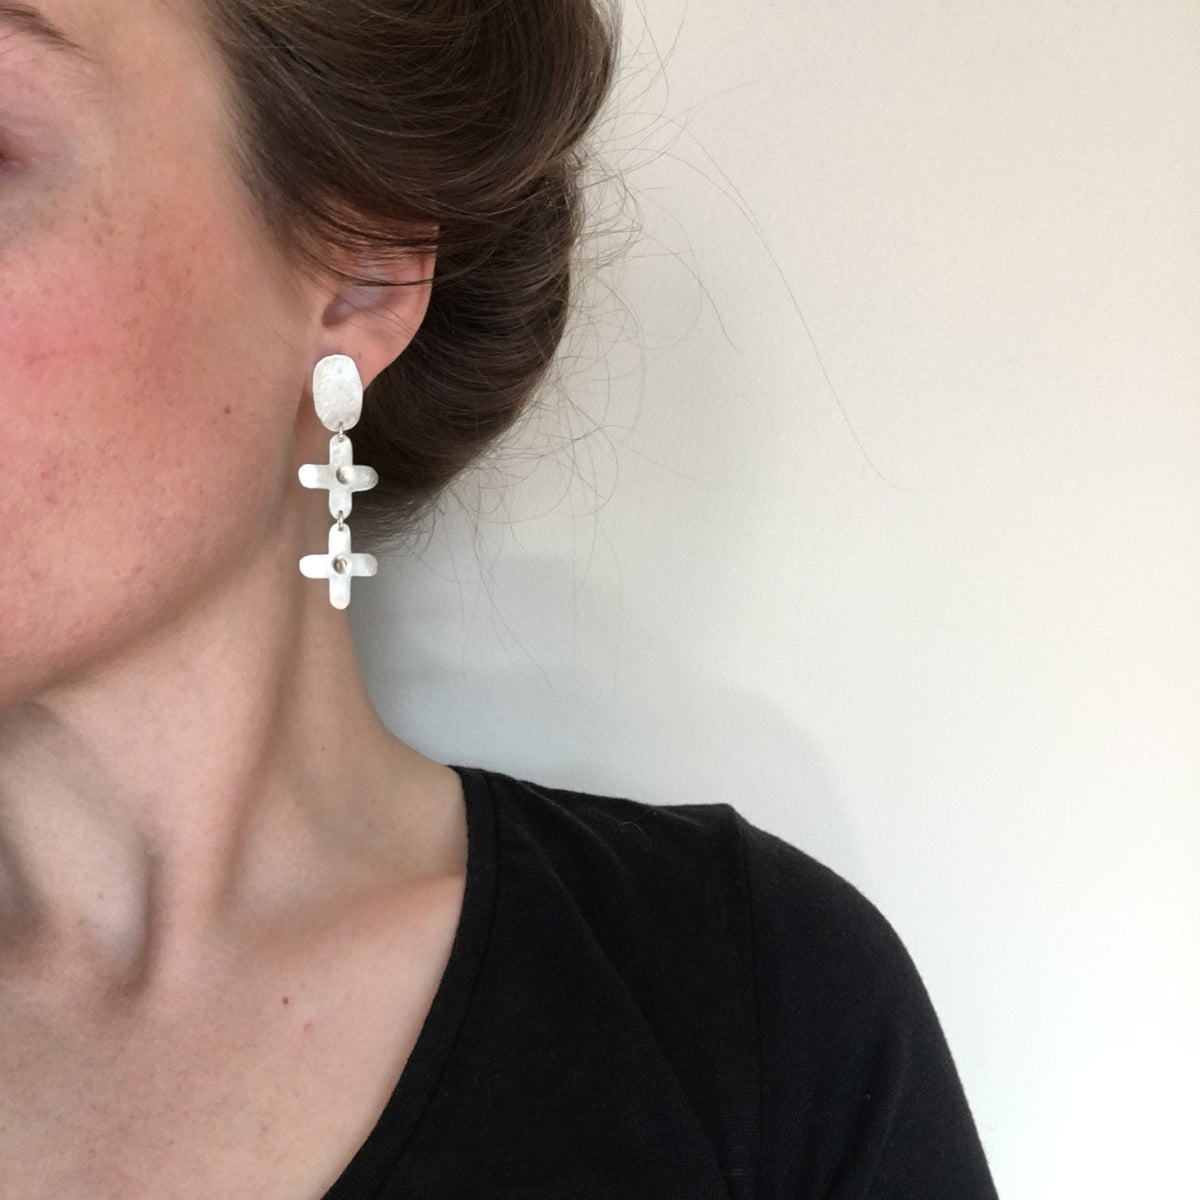 Image of mini anon earring